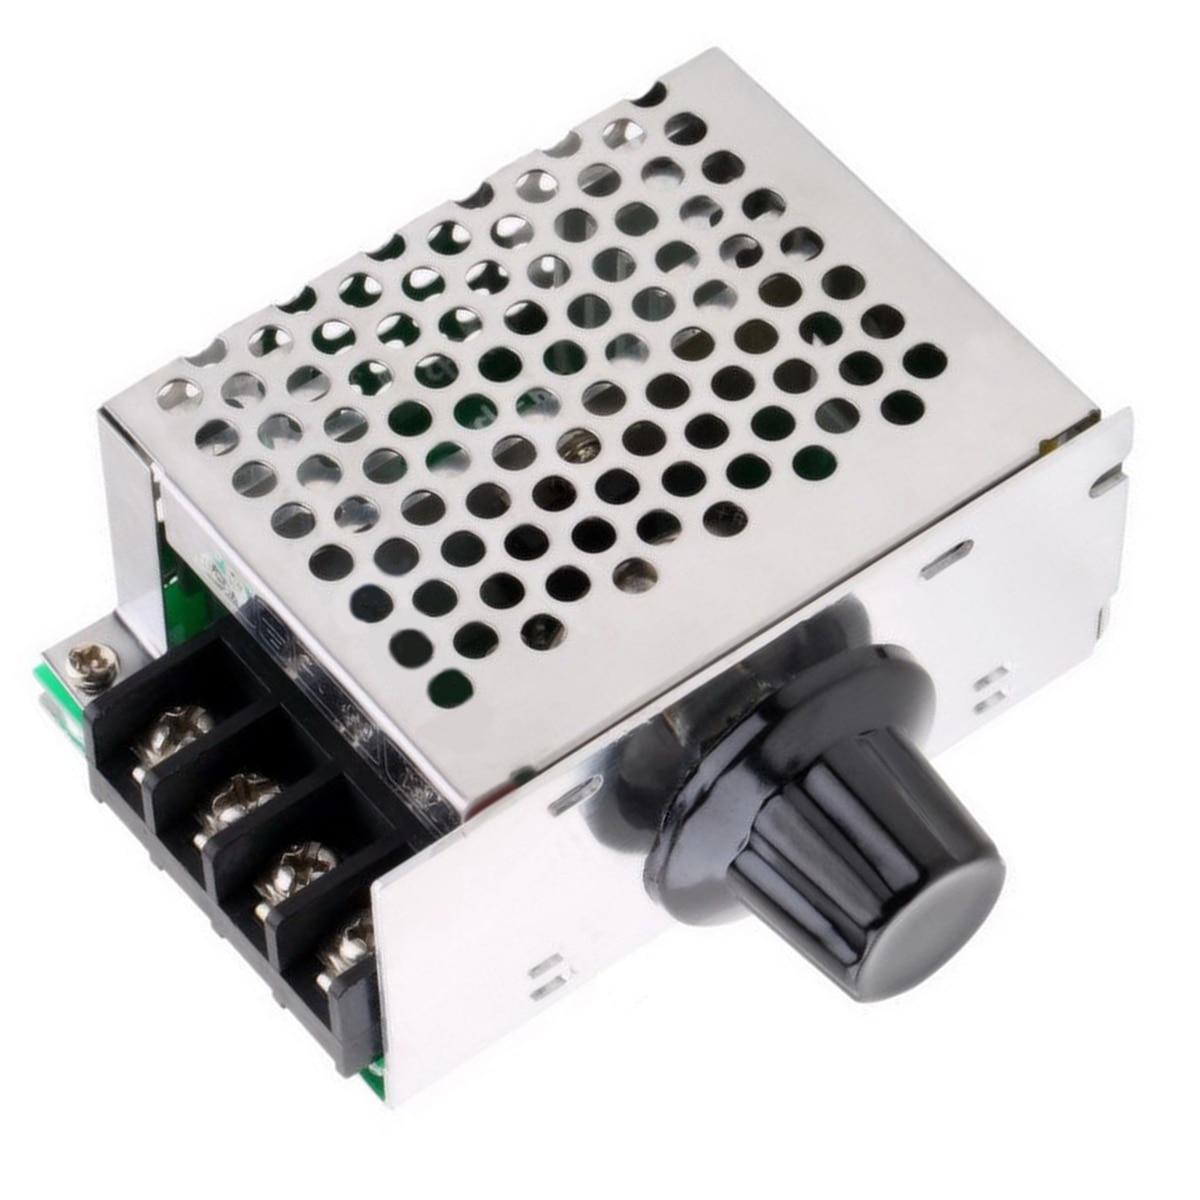 1Pc AC Regulator 4000W 220V AC SCR Motor Speed Controller Module Voltage Regulator Dimmer For Water Heater Mayitr in Voltage Regulators Stabilizers from Home Improvement